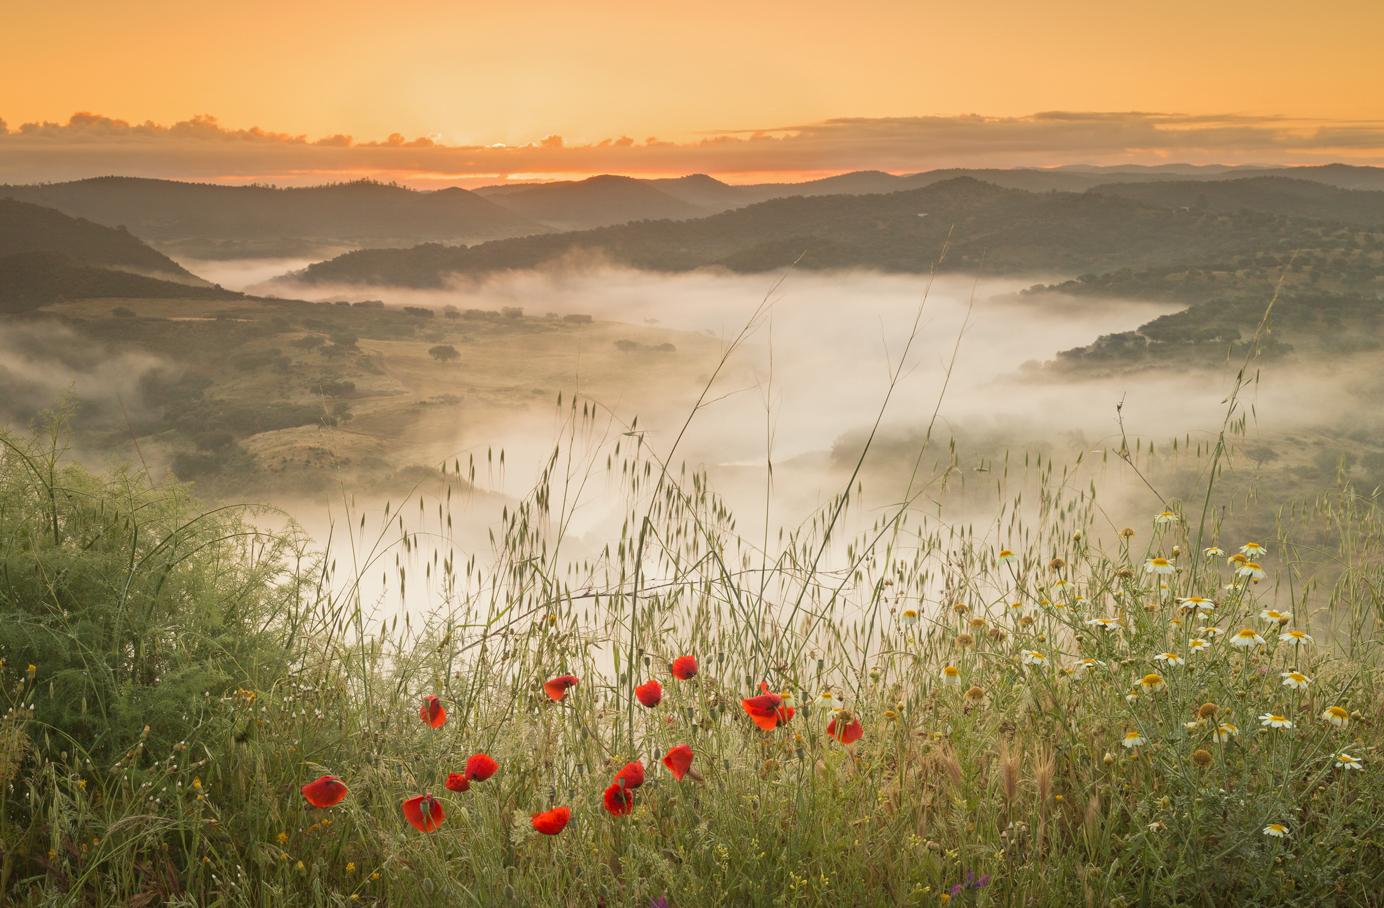 Sunrise on the Iberian Border by Czech Conroy